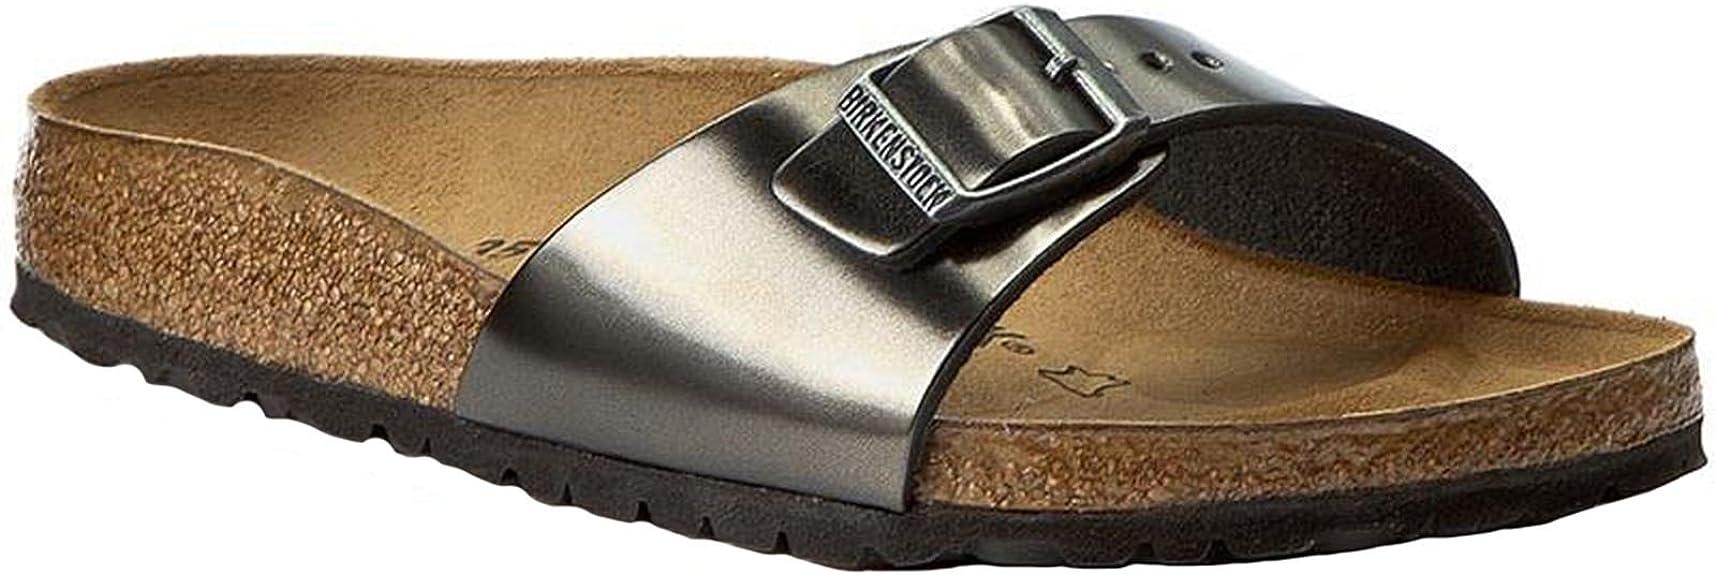 Birkenstock Womens Madrid Leather Sandals: Amazon.it: Scarpe